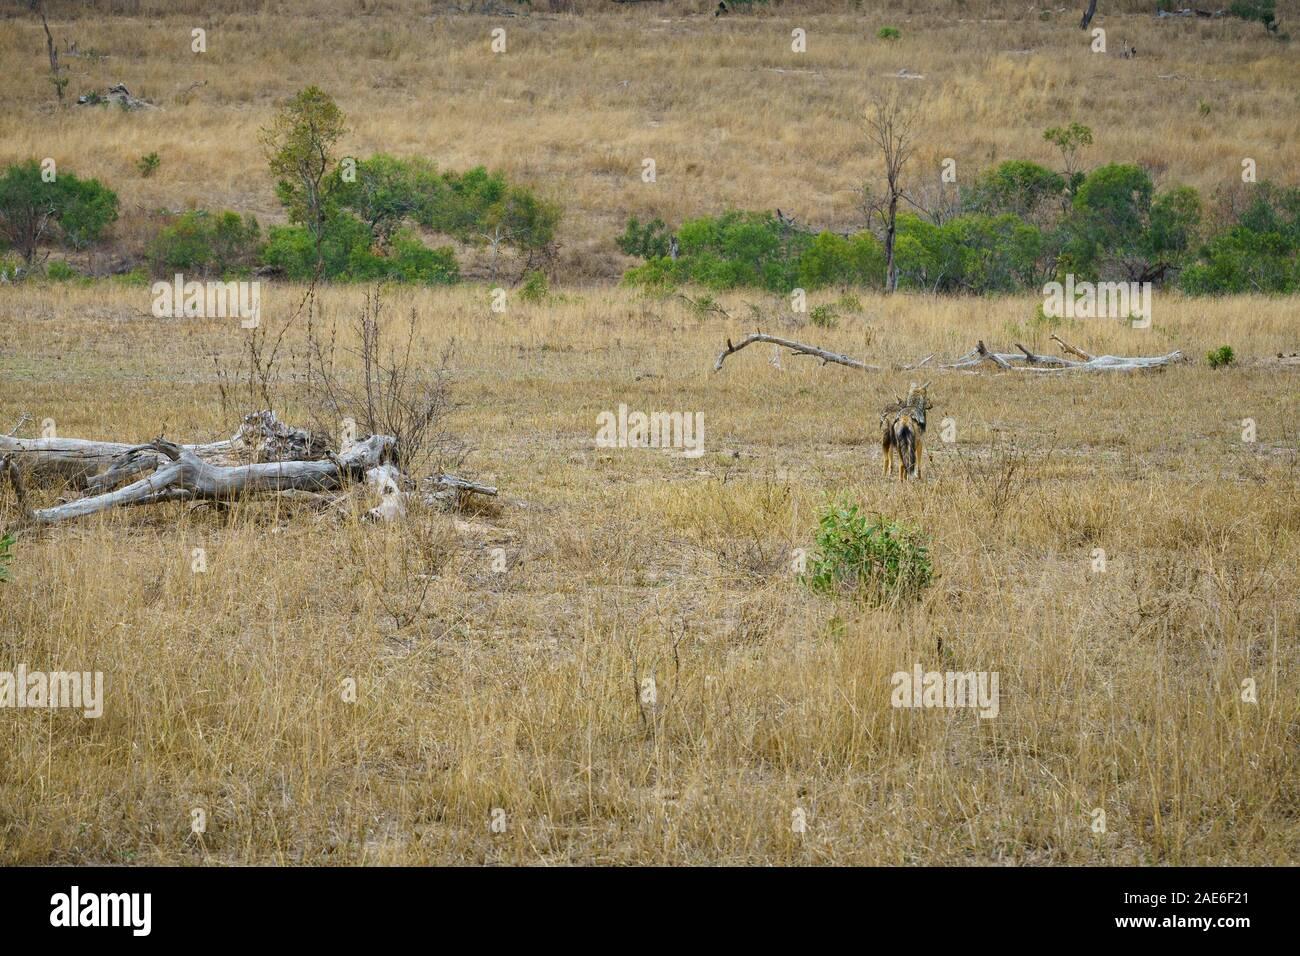 Wild sciacalli nel parco nazionale di Kruger a Mpumalanga in Sudafrica Foto Stock